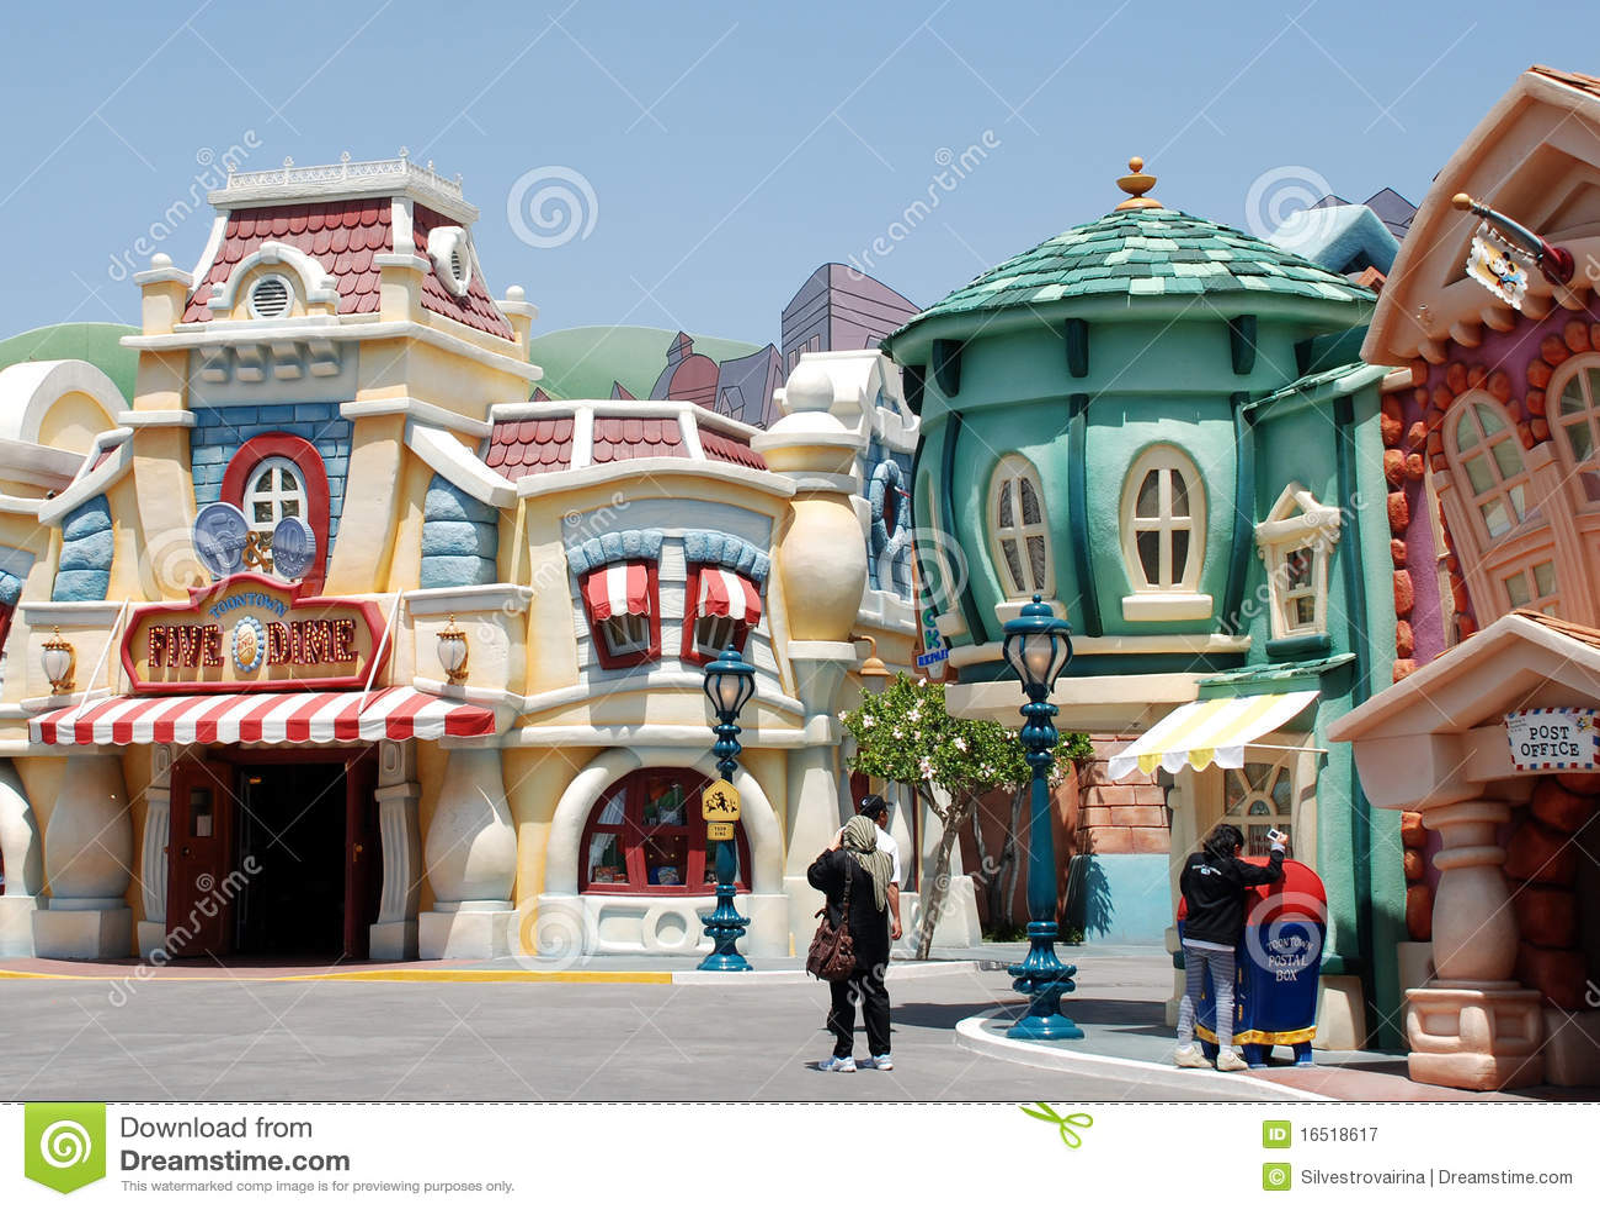 Mickey s toontown in Disneyland